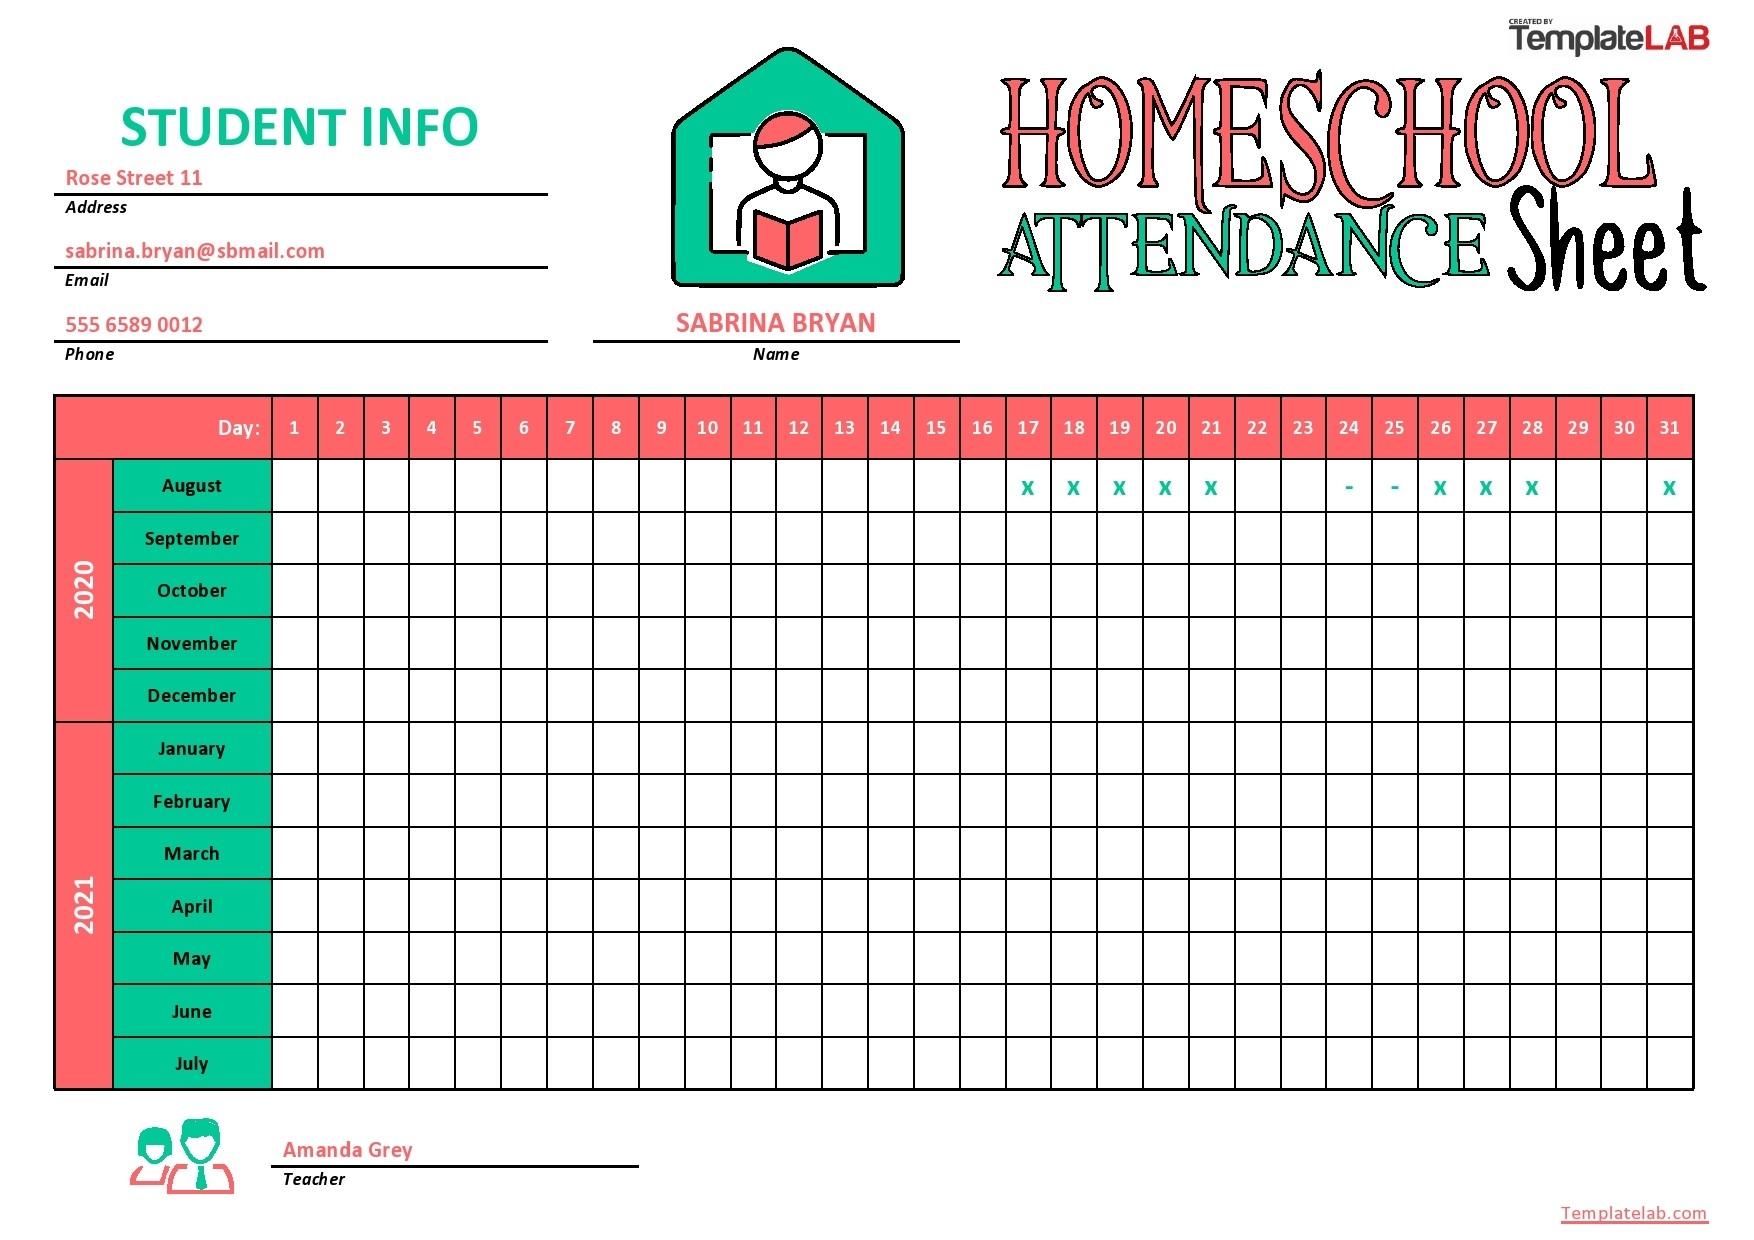 43 Free Printable Attendance Sheet Templates - Templatelab-Attendance Sheet Template For 2021